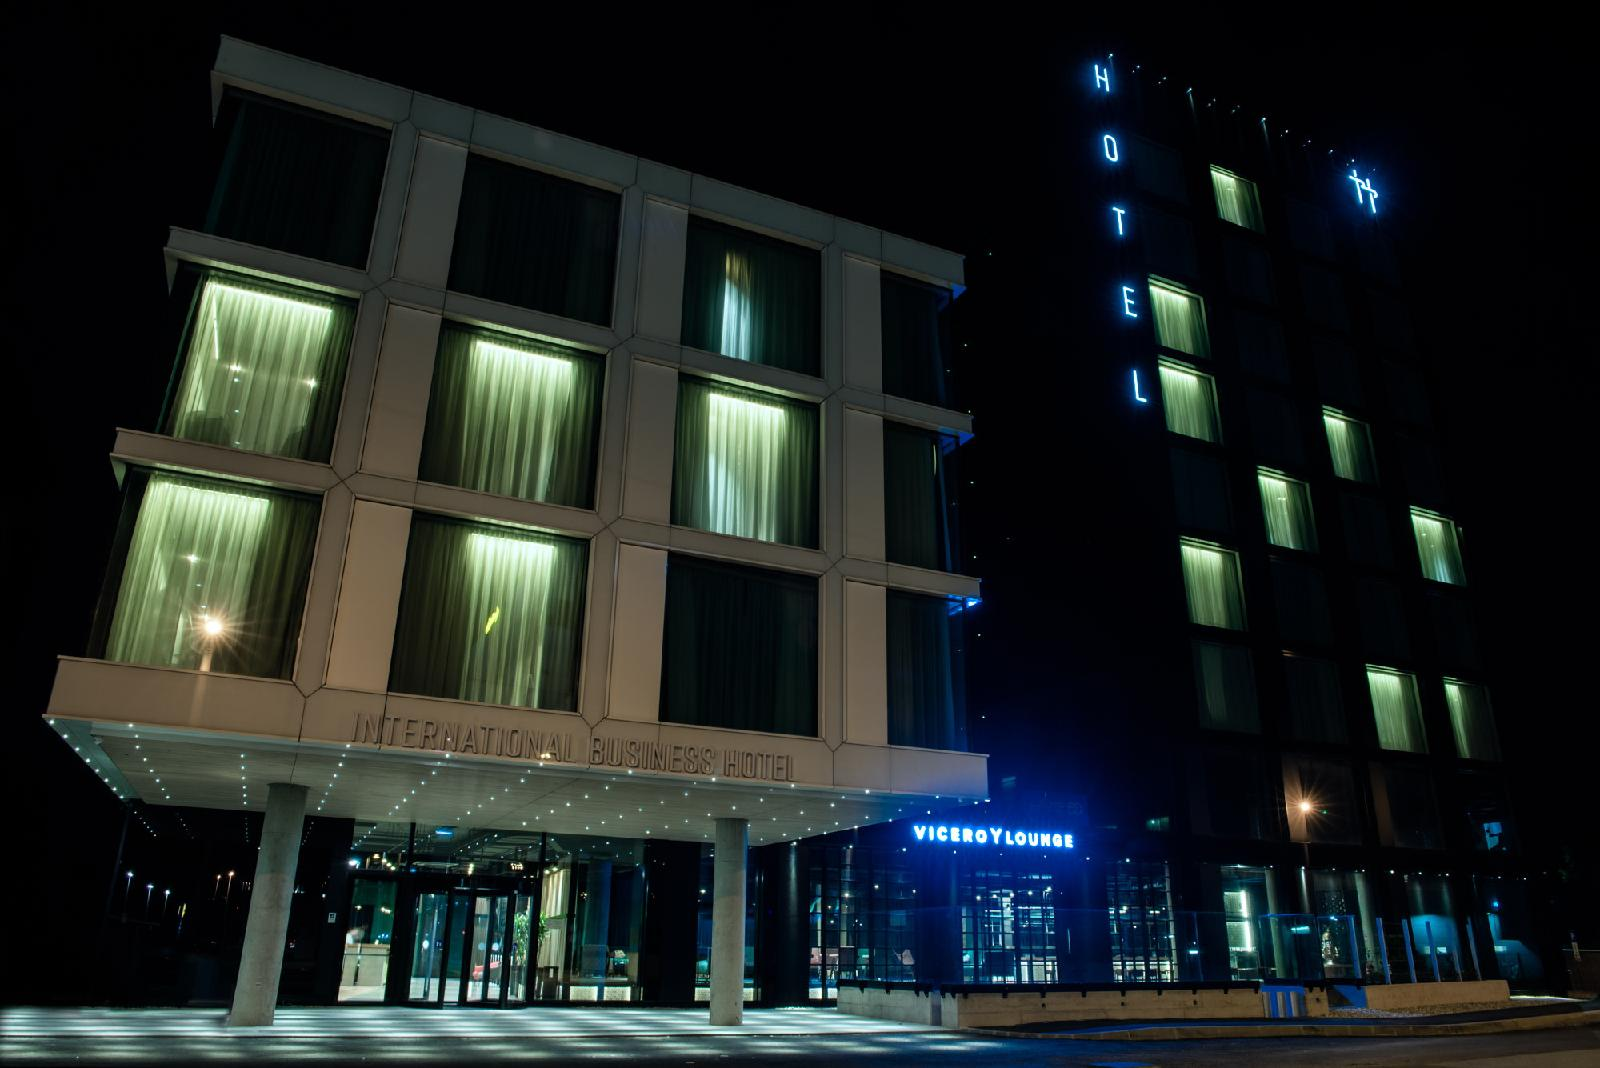 International Business Hotel Image 8